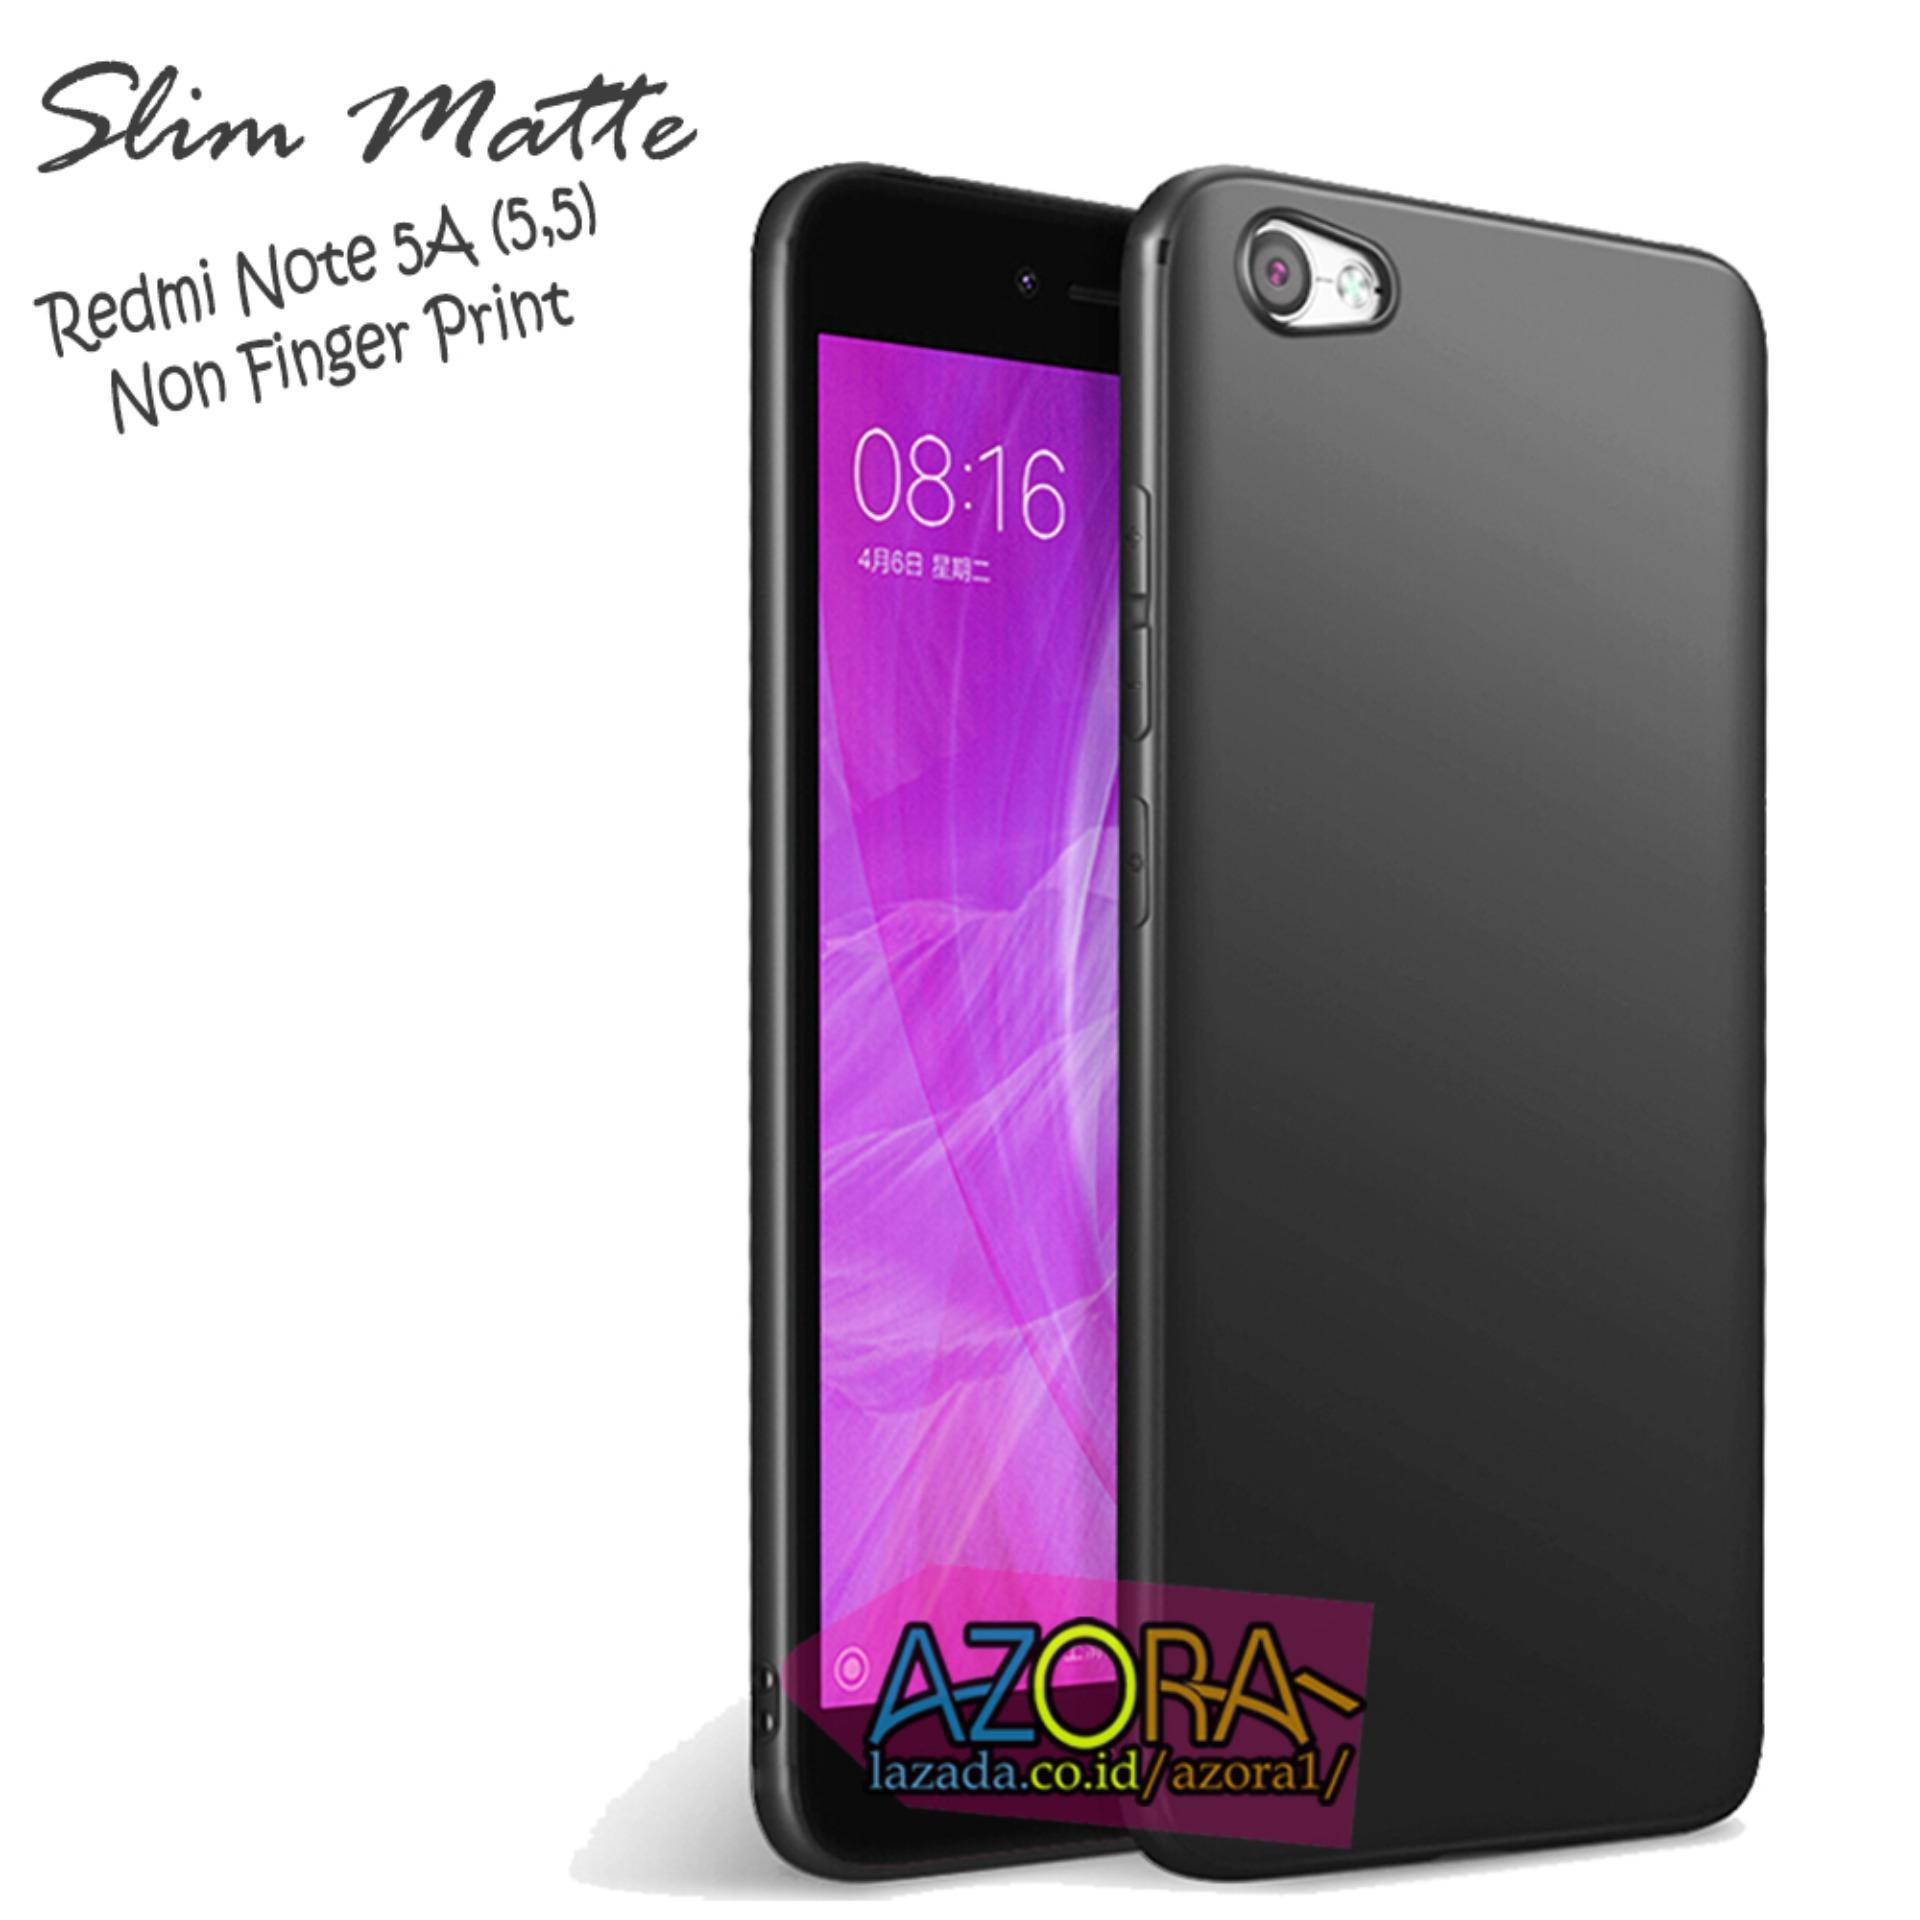 Kelebihan Case Slim Black Matte Xiaomi Redmi Note 5a Non Finger Temperred Glass Softcase 3 Print Baby Skin Ultra Thin